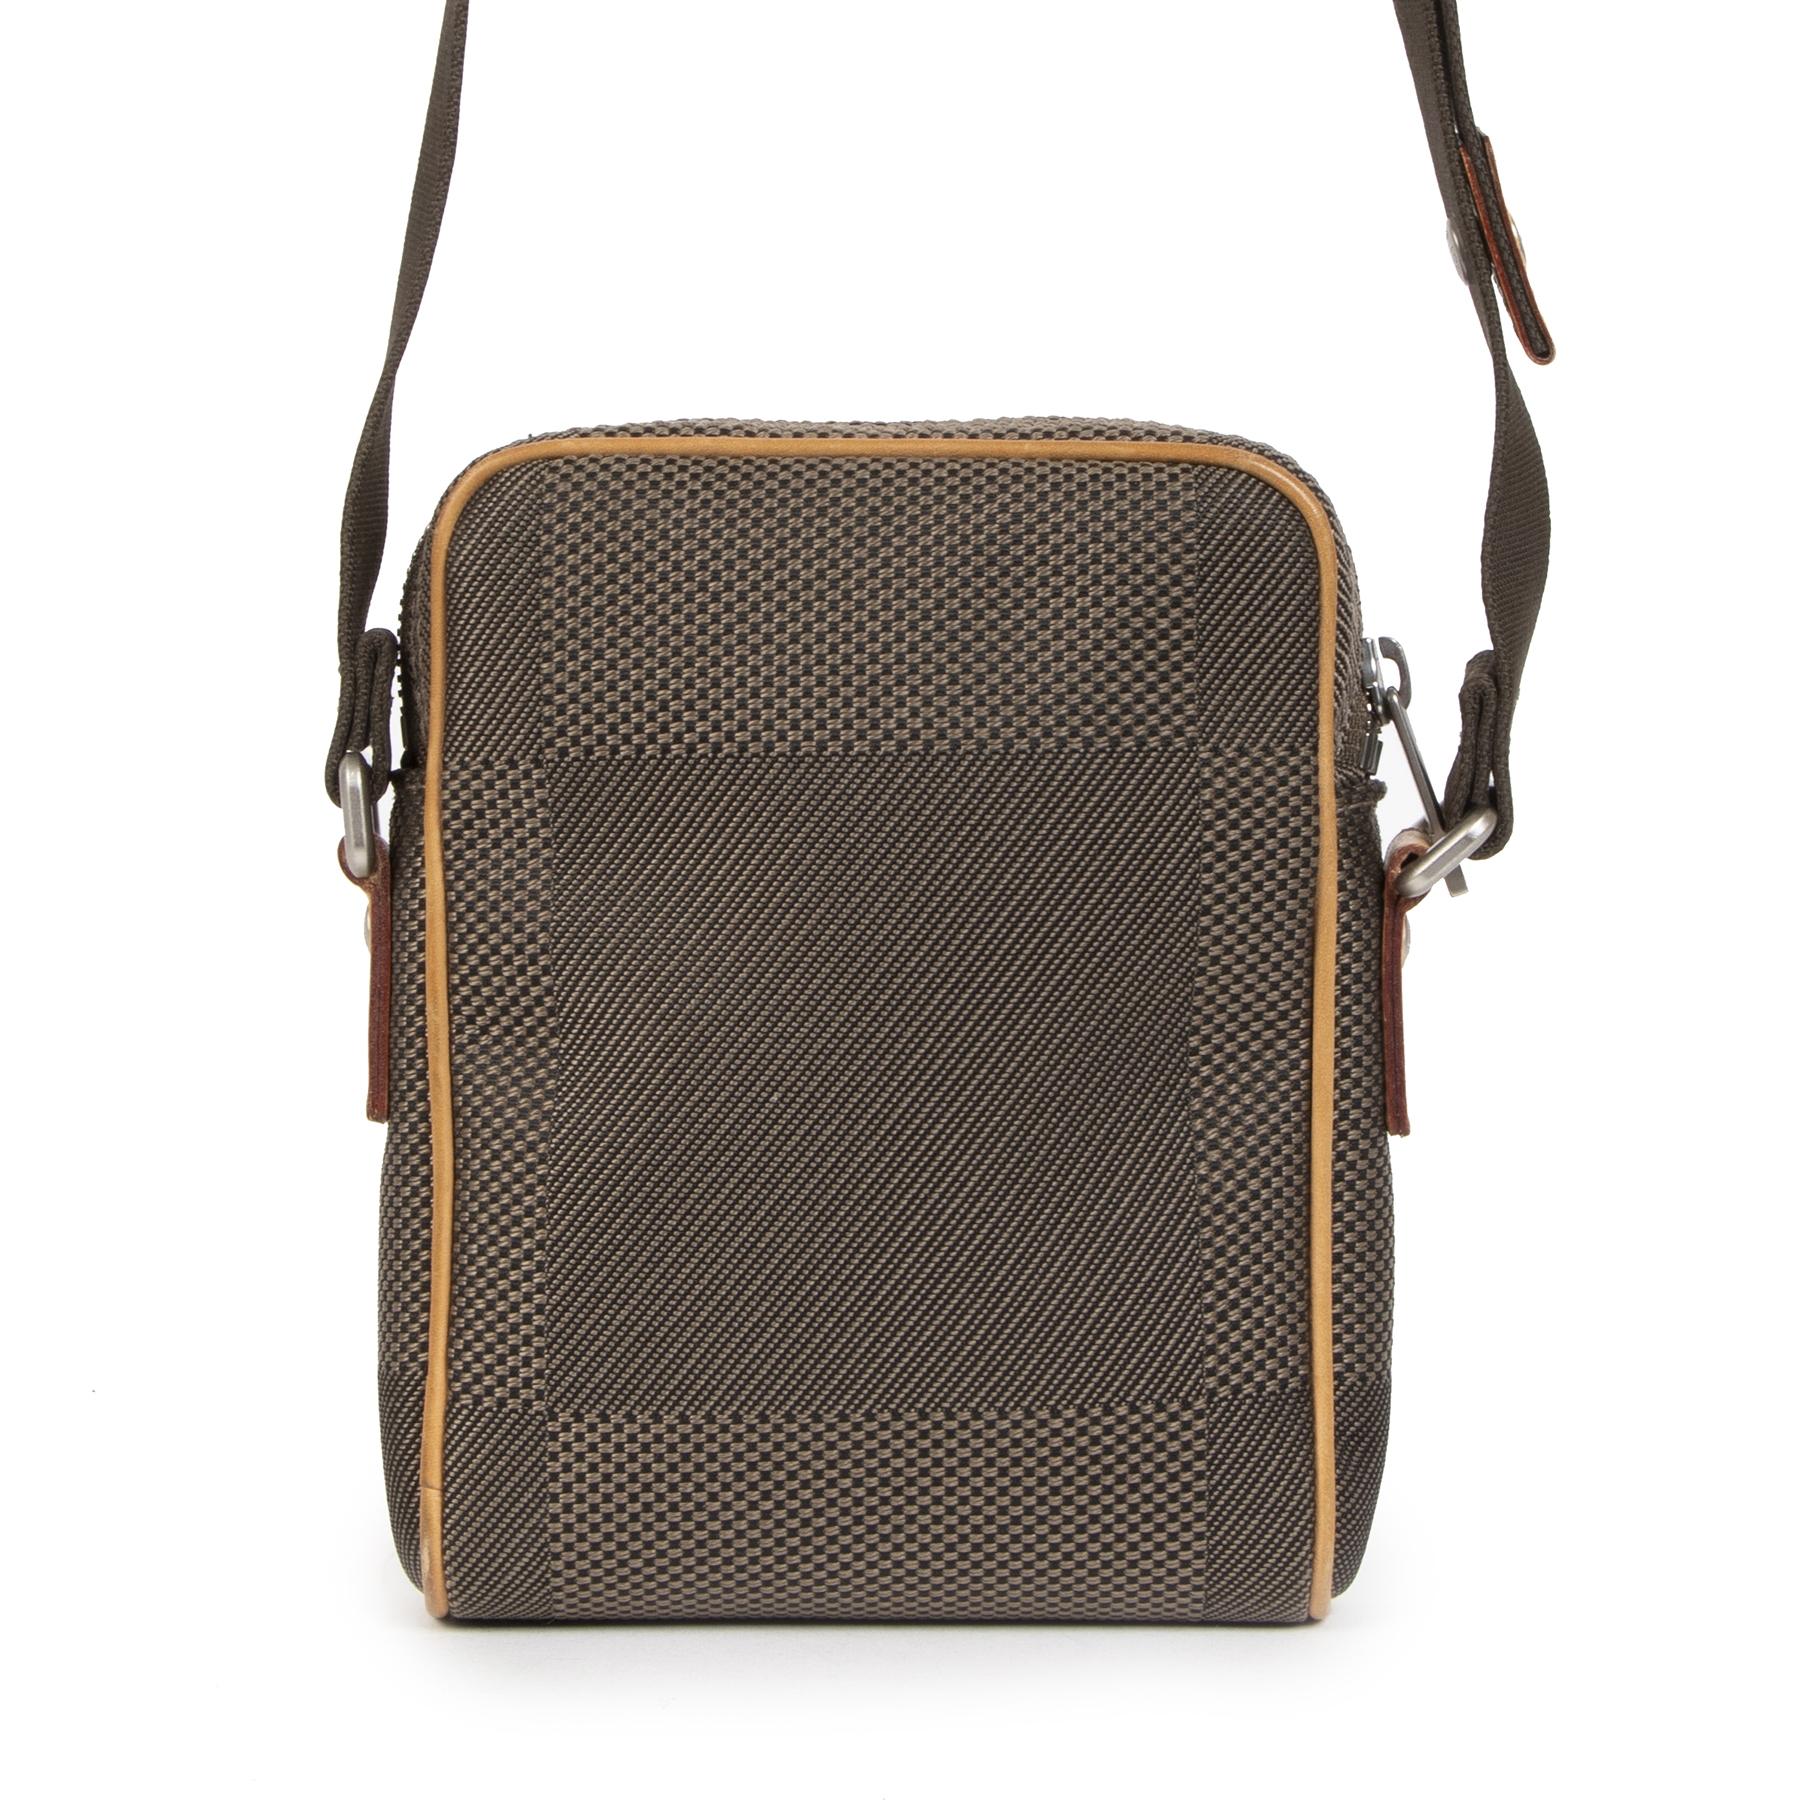 Authentic secondhand Louis Vuitton Compagnon Grey Damier Geant Canvas Bag designer bags designer brands fashion luxury vintage webshop safe secure online shopping worldwide shipping